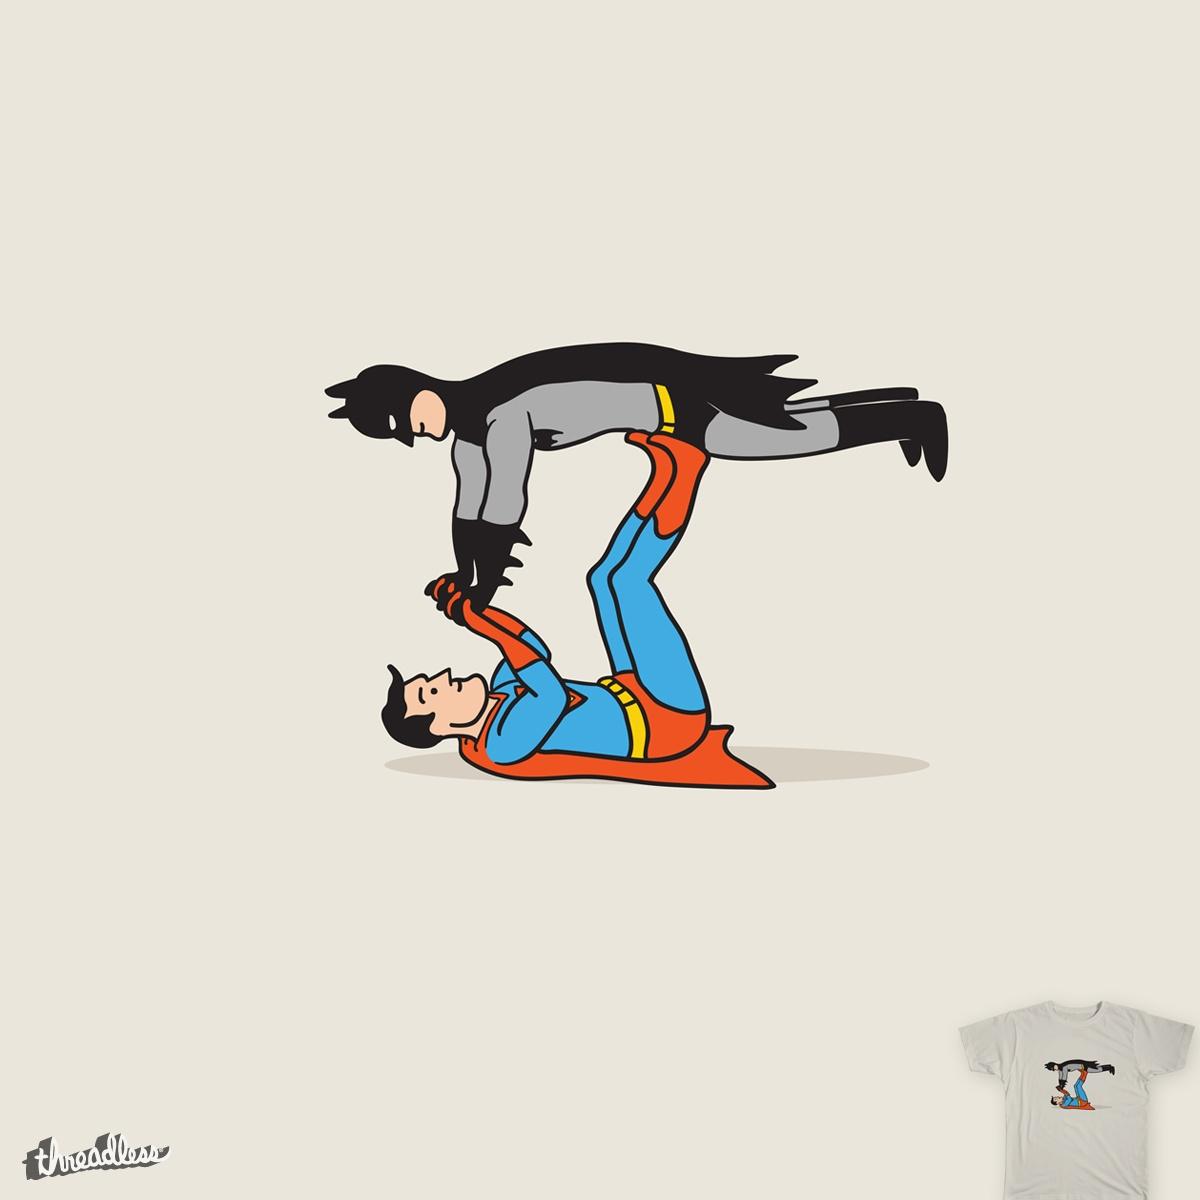 SUPERMAAAAANNNNNNN! by murraymullet on Threadless